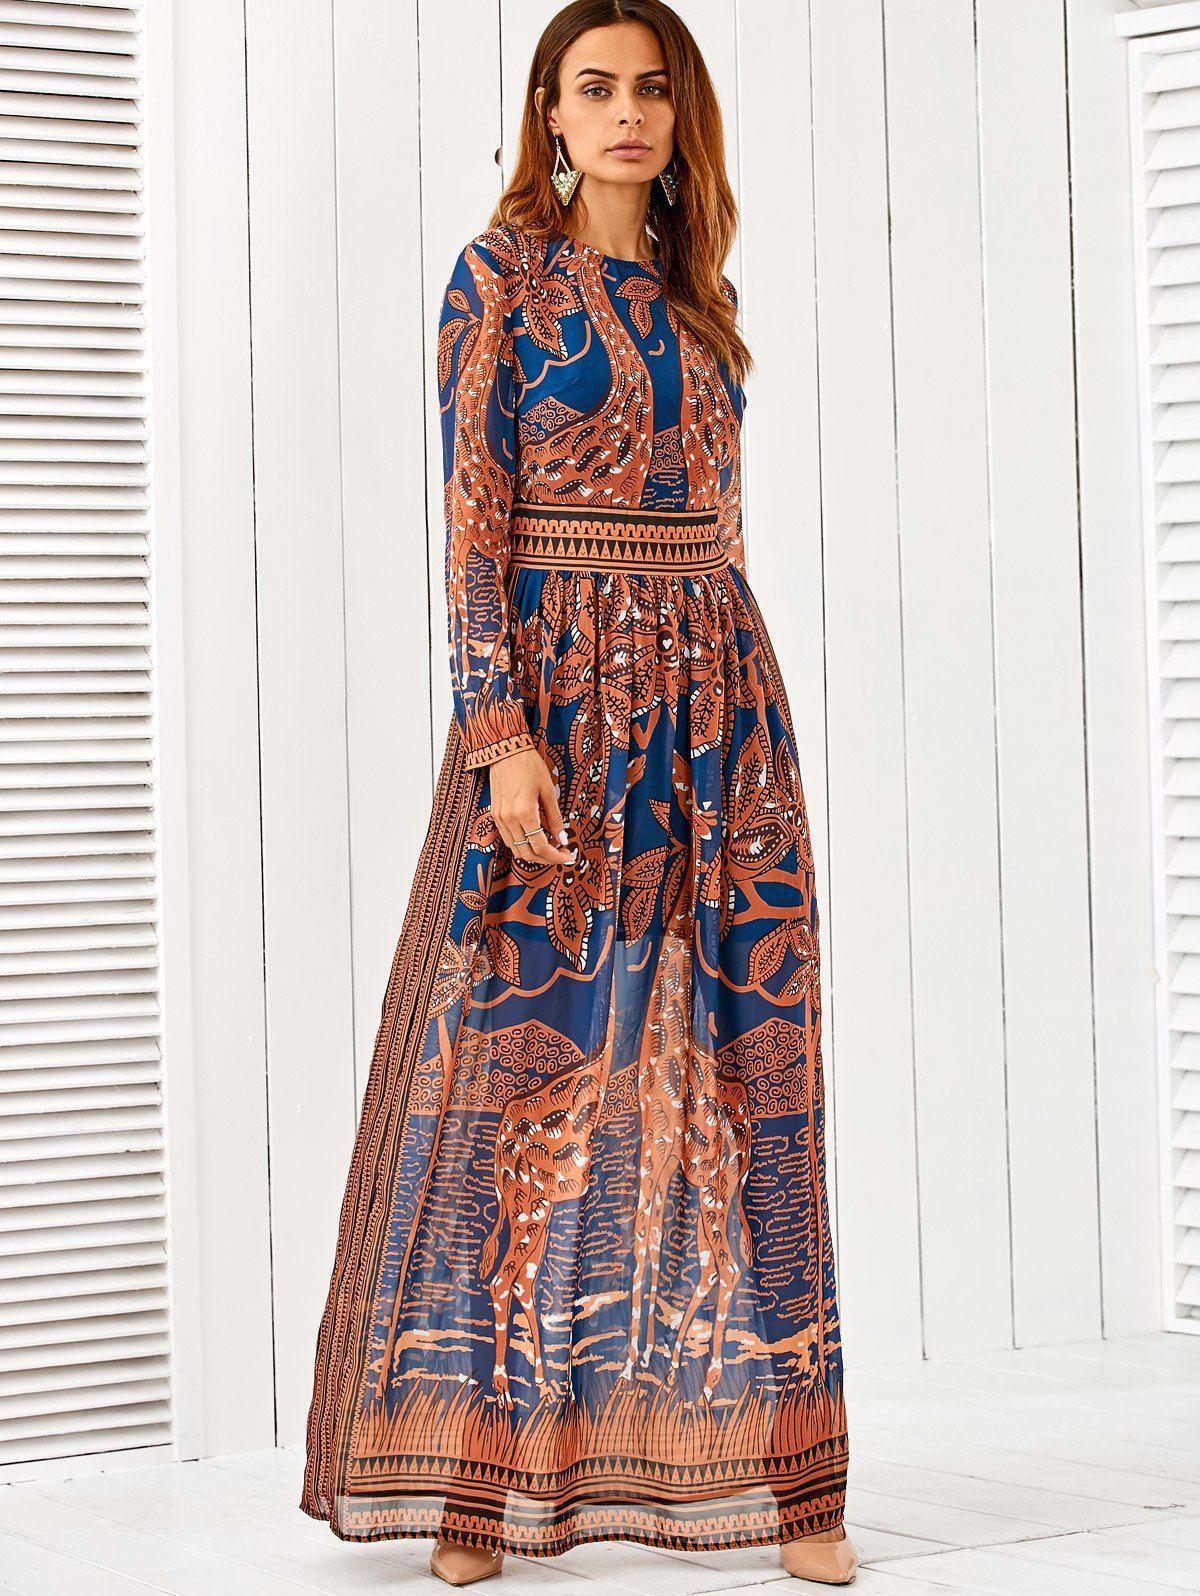 Giraffes Print Vintage Maxi Dress Blue Maxi Dresses Zaful Womens Maxi Dresses Maxi Dress Maxi Dress With Sleeves [ 1596 x 1200 Pixel ]